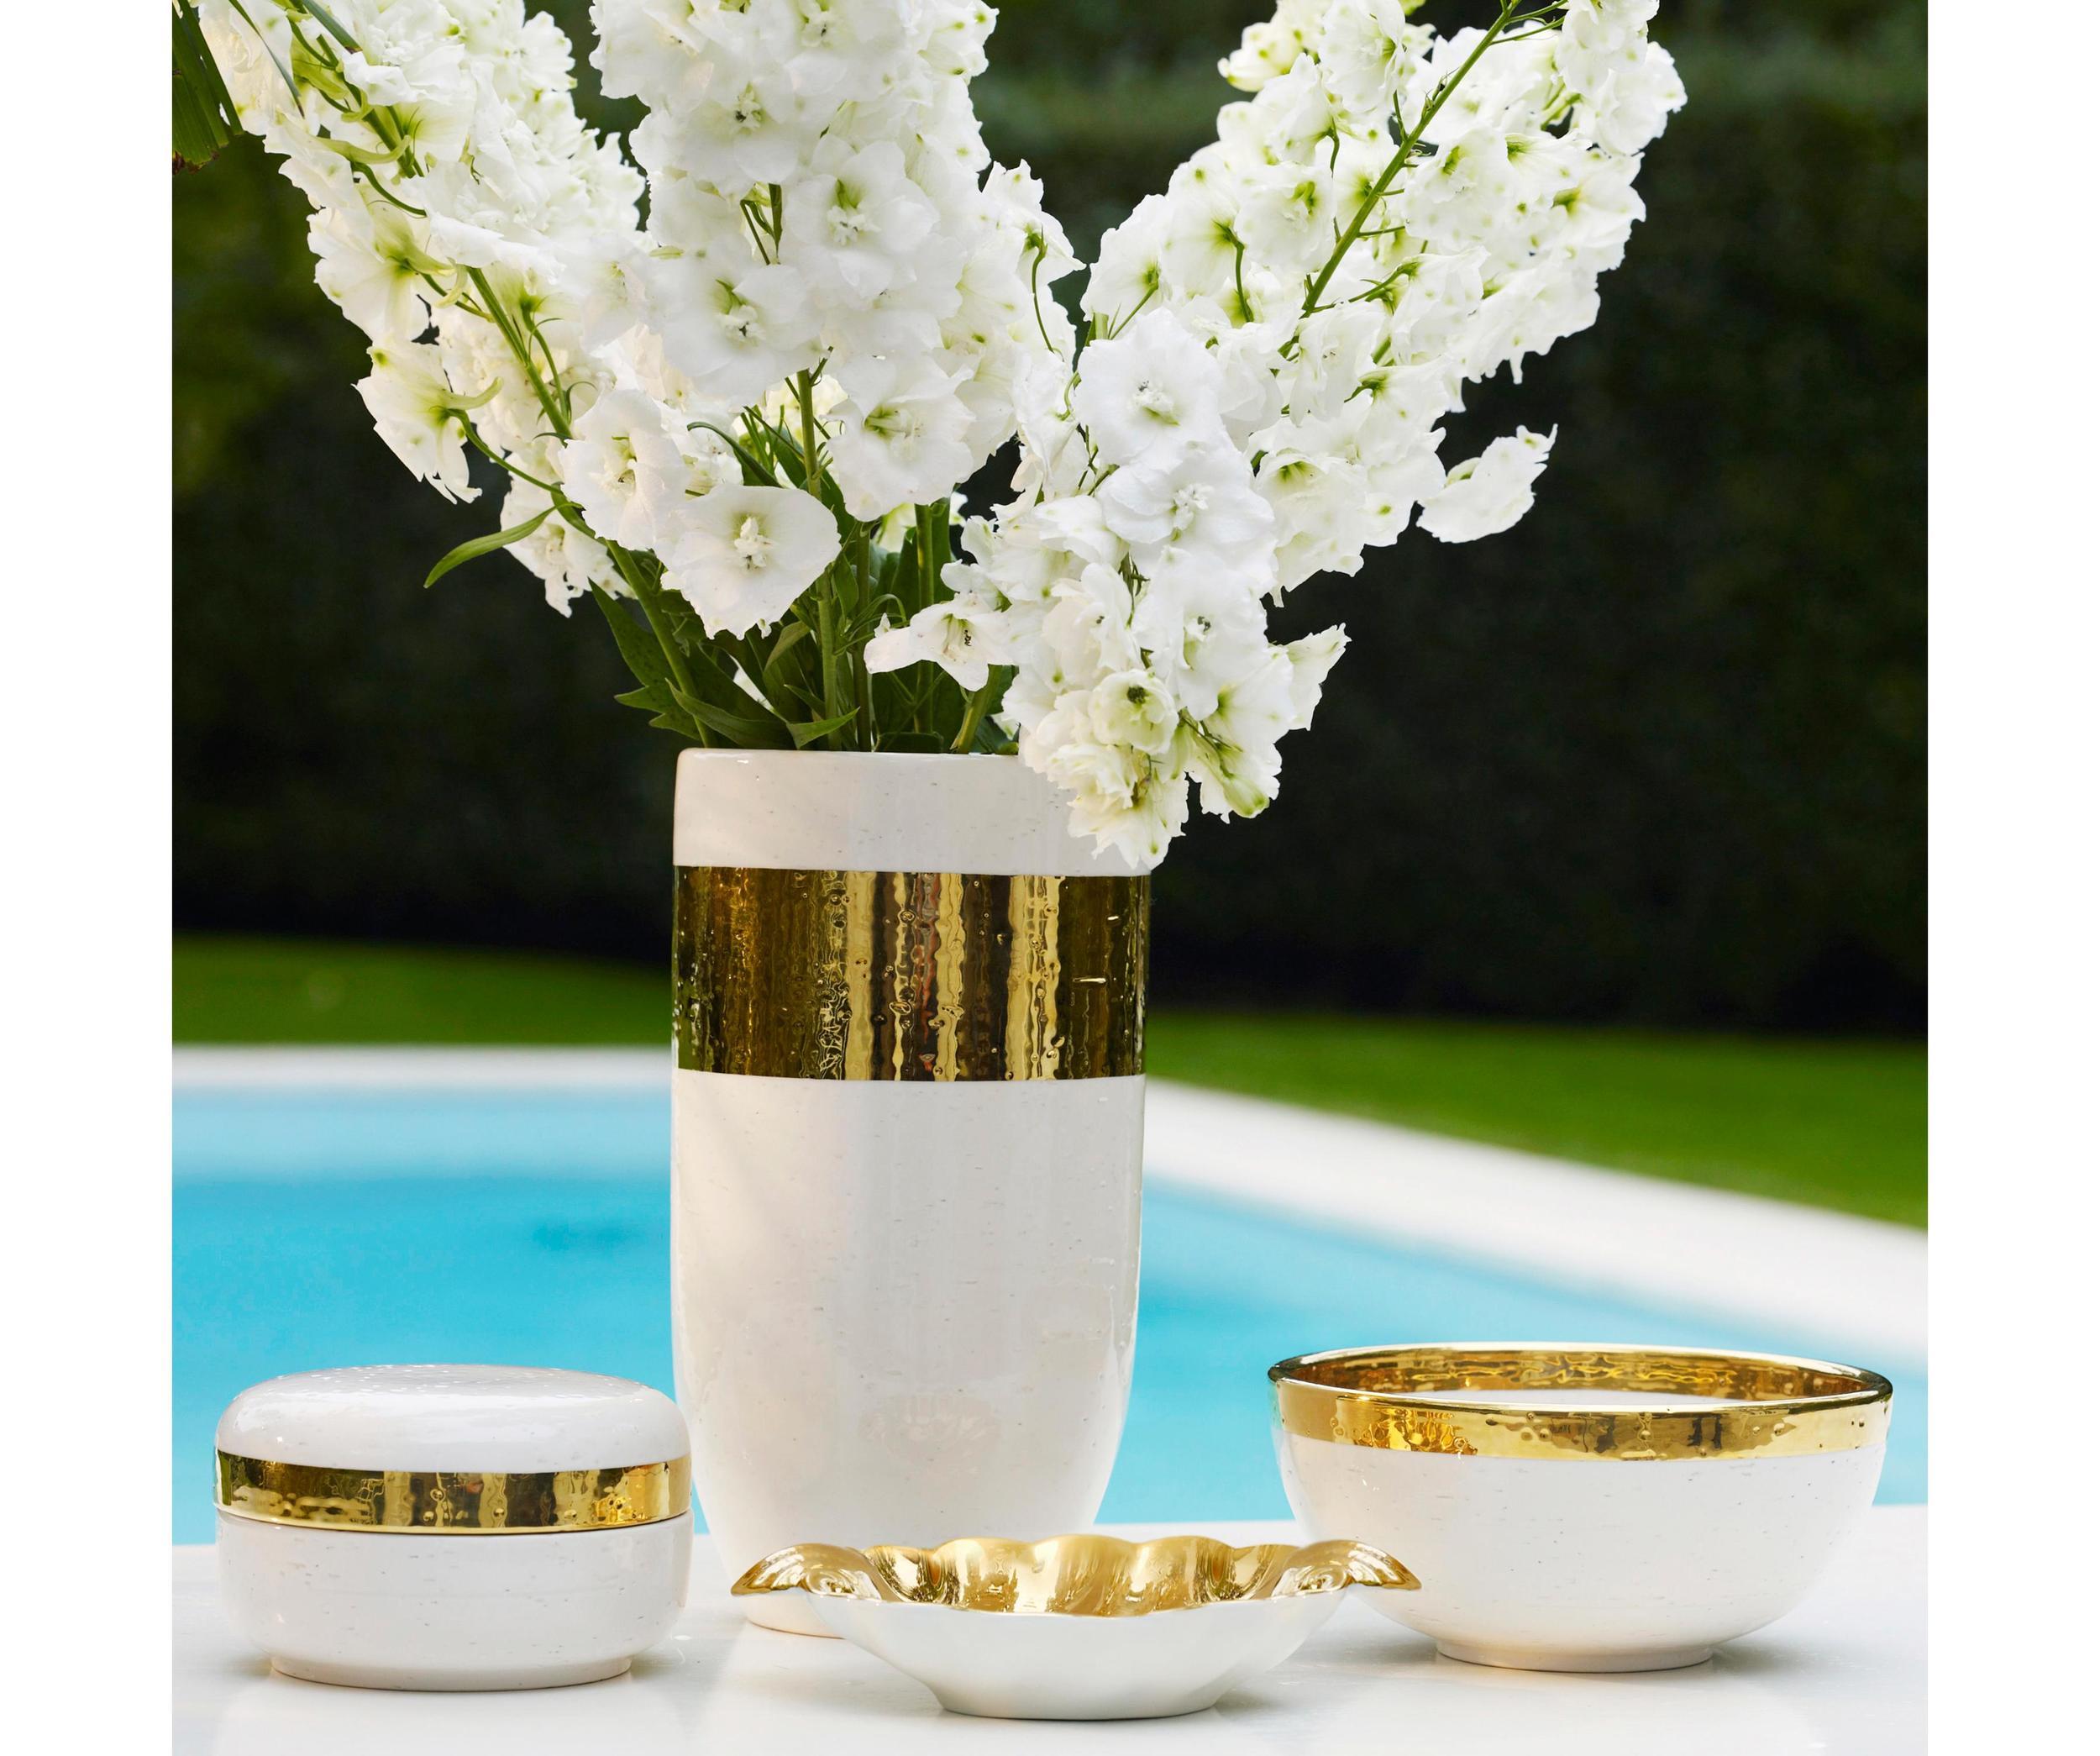 Golden Rule - Decorative objets by Aerin | MSH Agency.jpeg